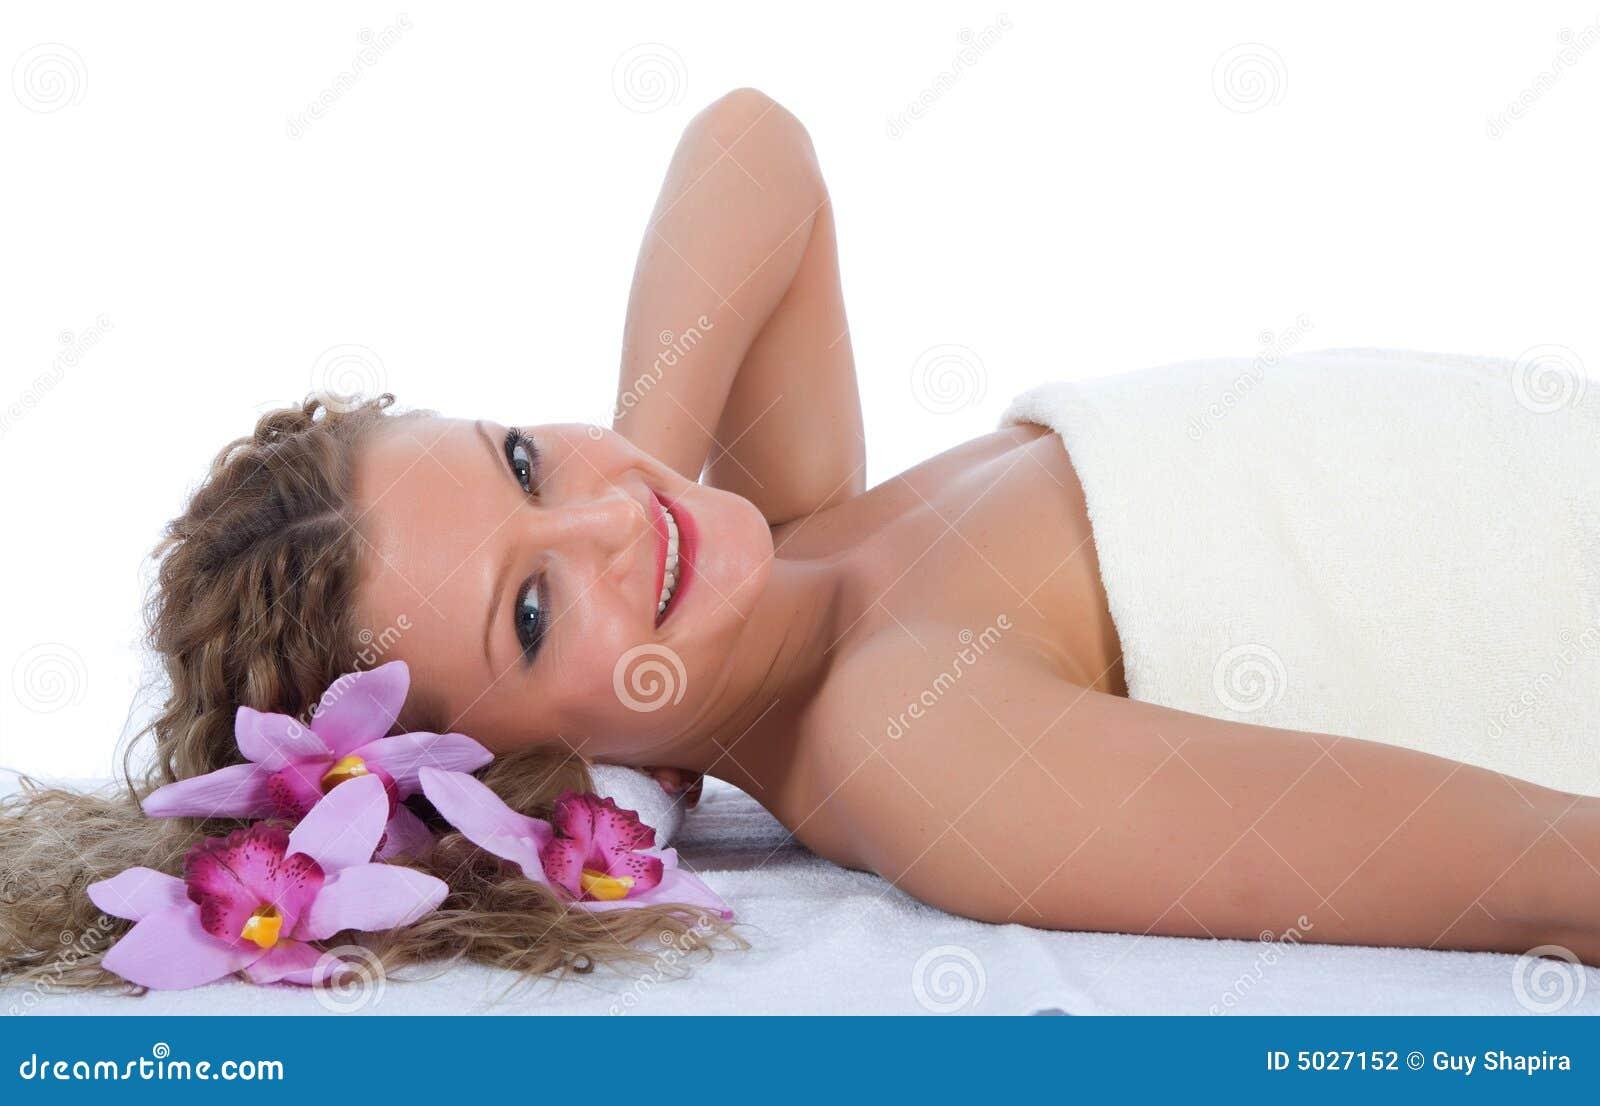 Attractive woman at spa